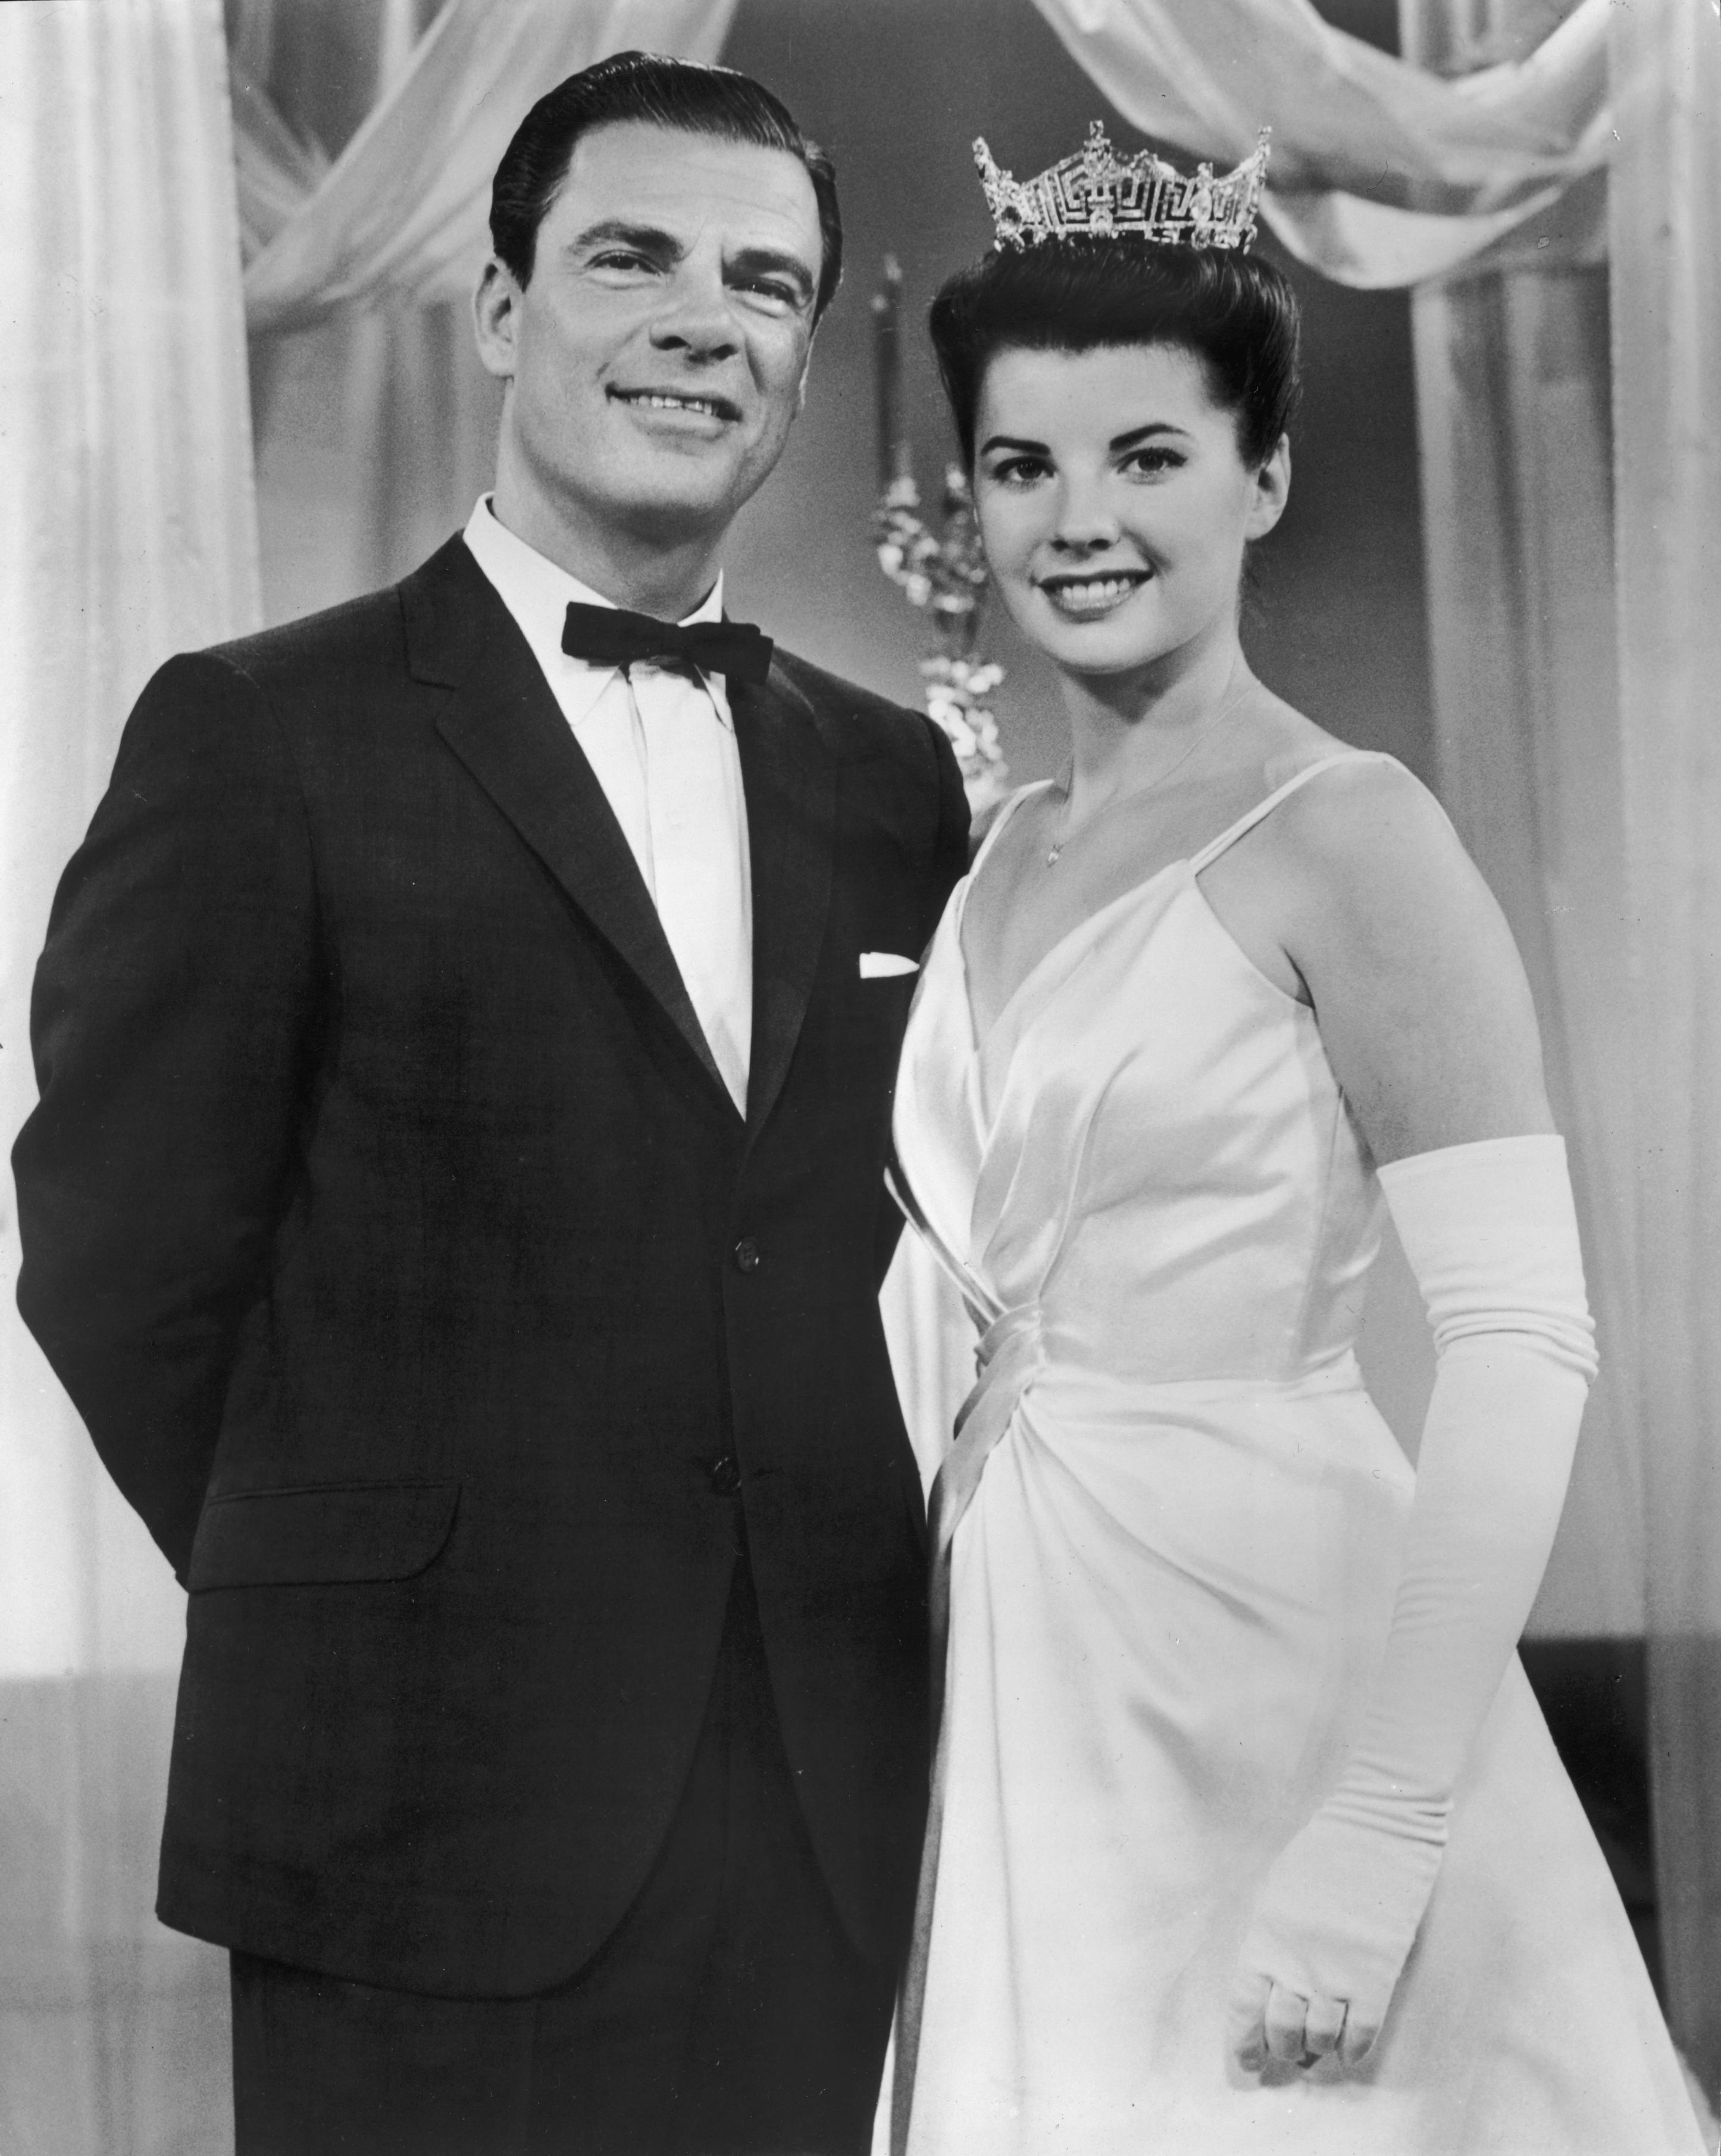 1963: Jacquelyn Mayer from Sandusky, Ohio